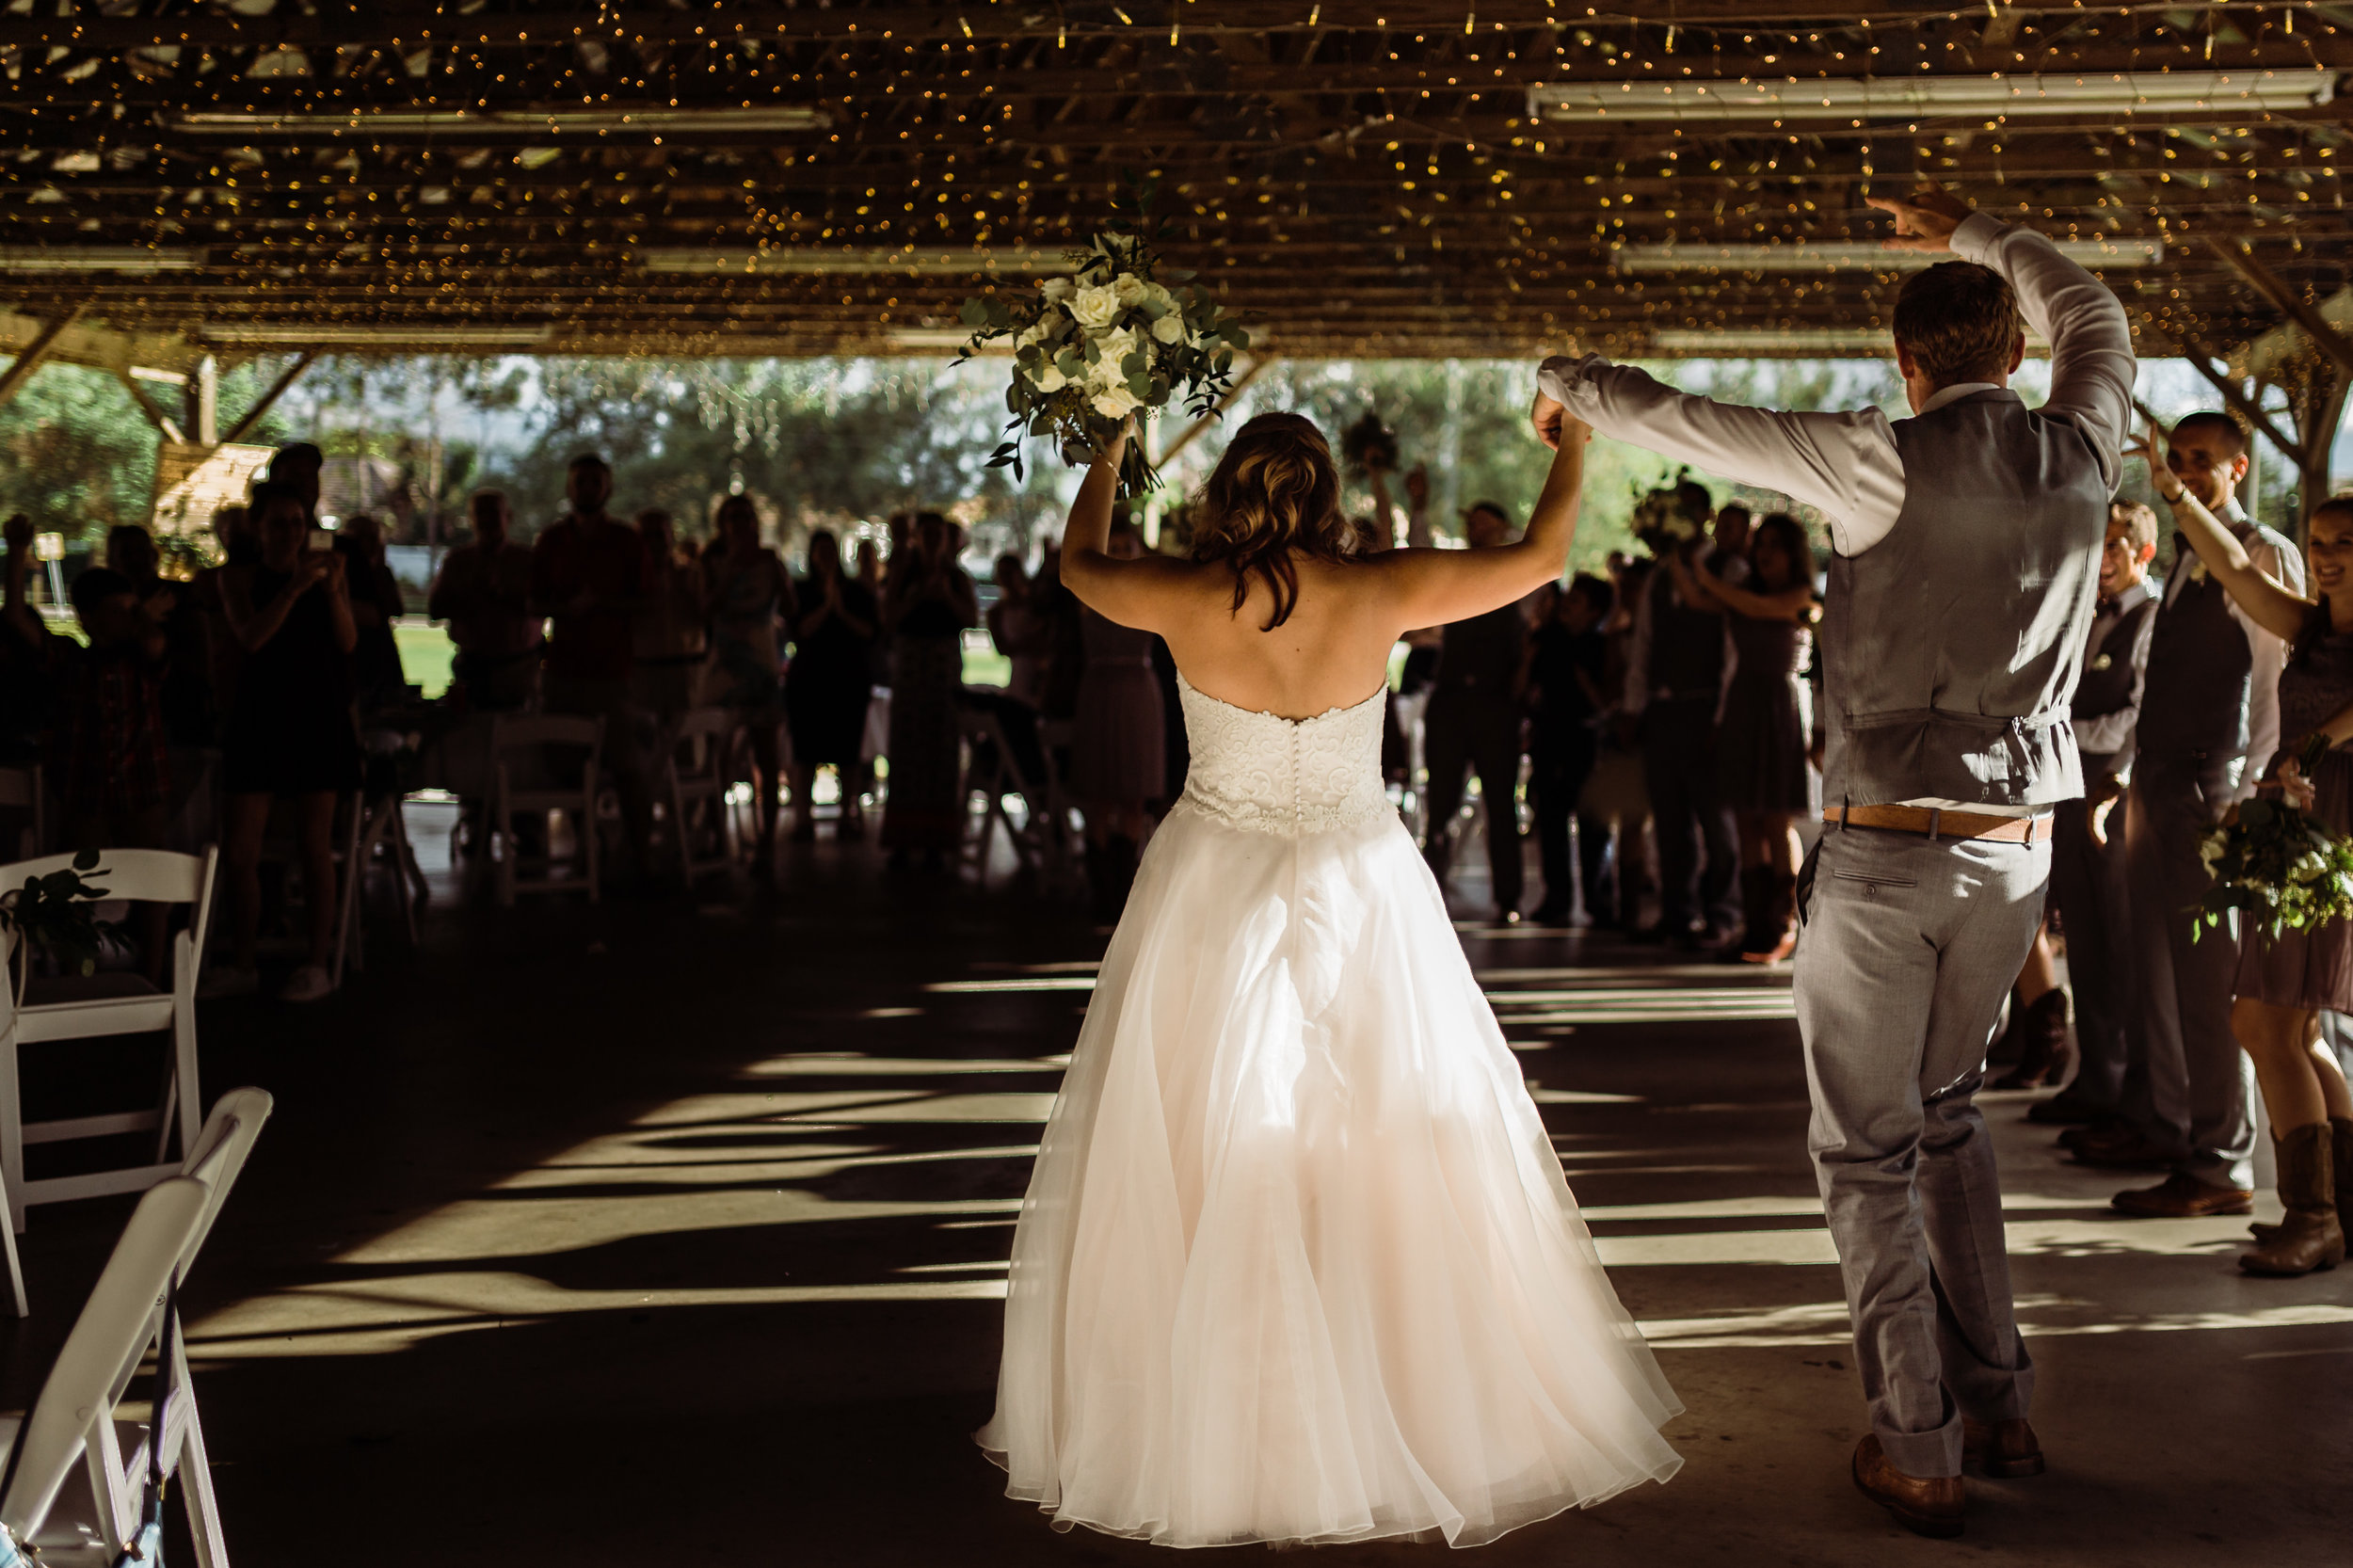 2017.10.14 Samantha and Matthew Crabtree Sarasota Wedding (434 of 708).jpg